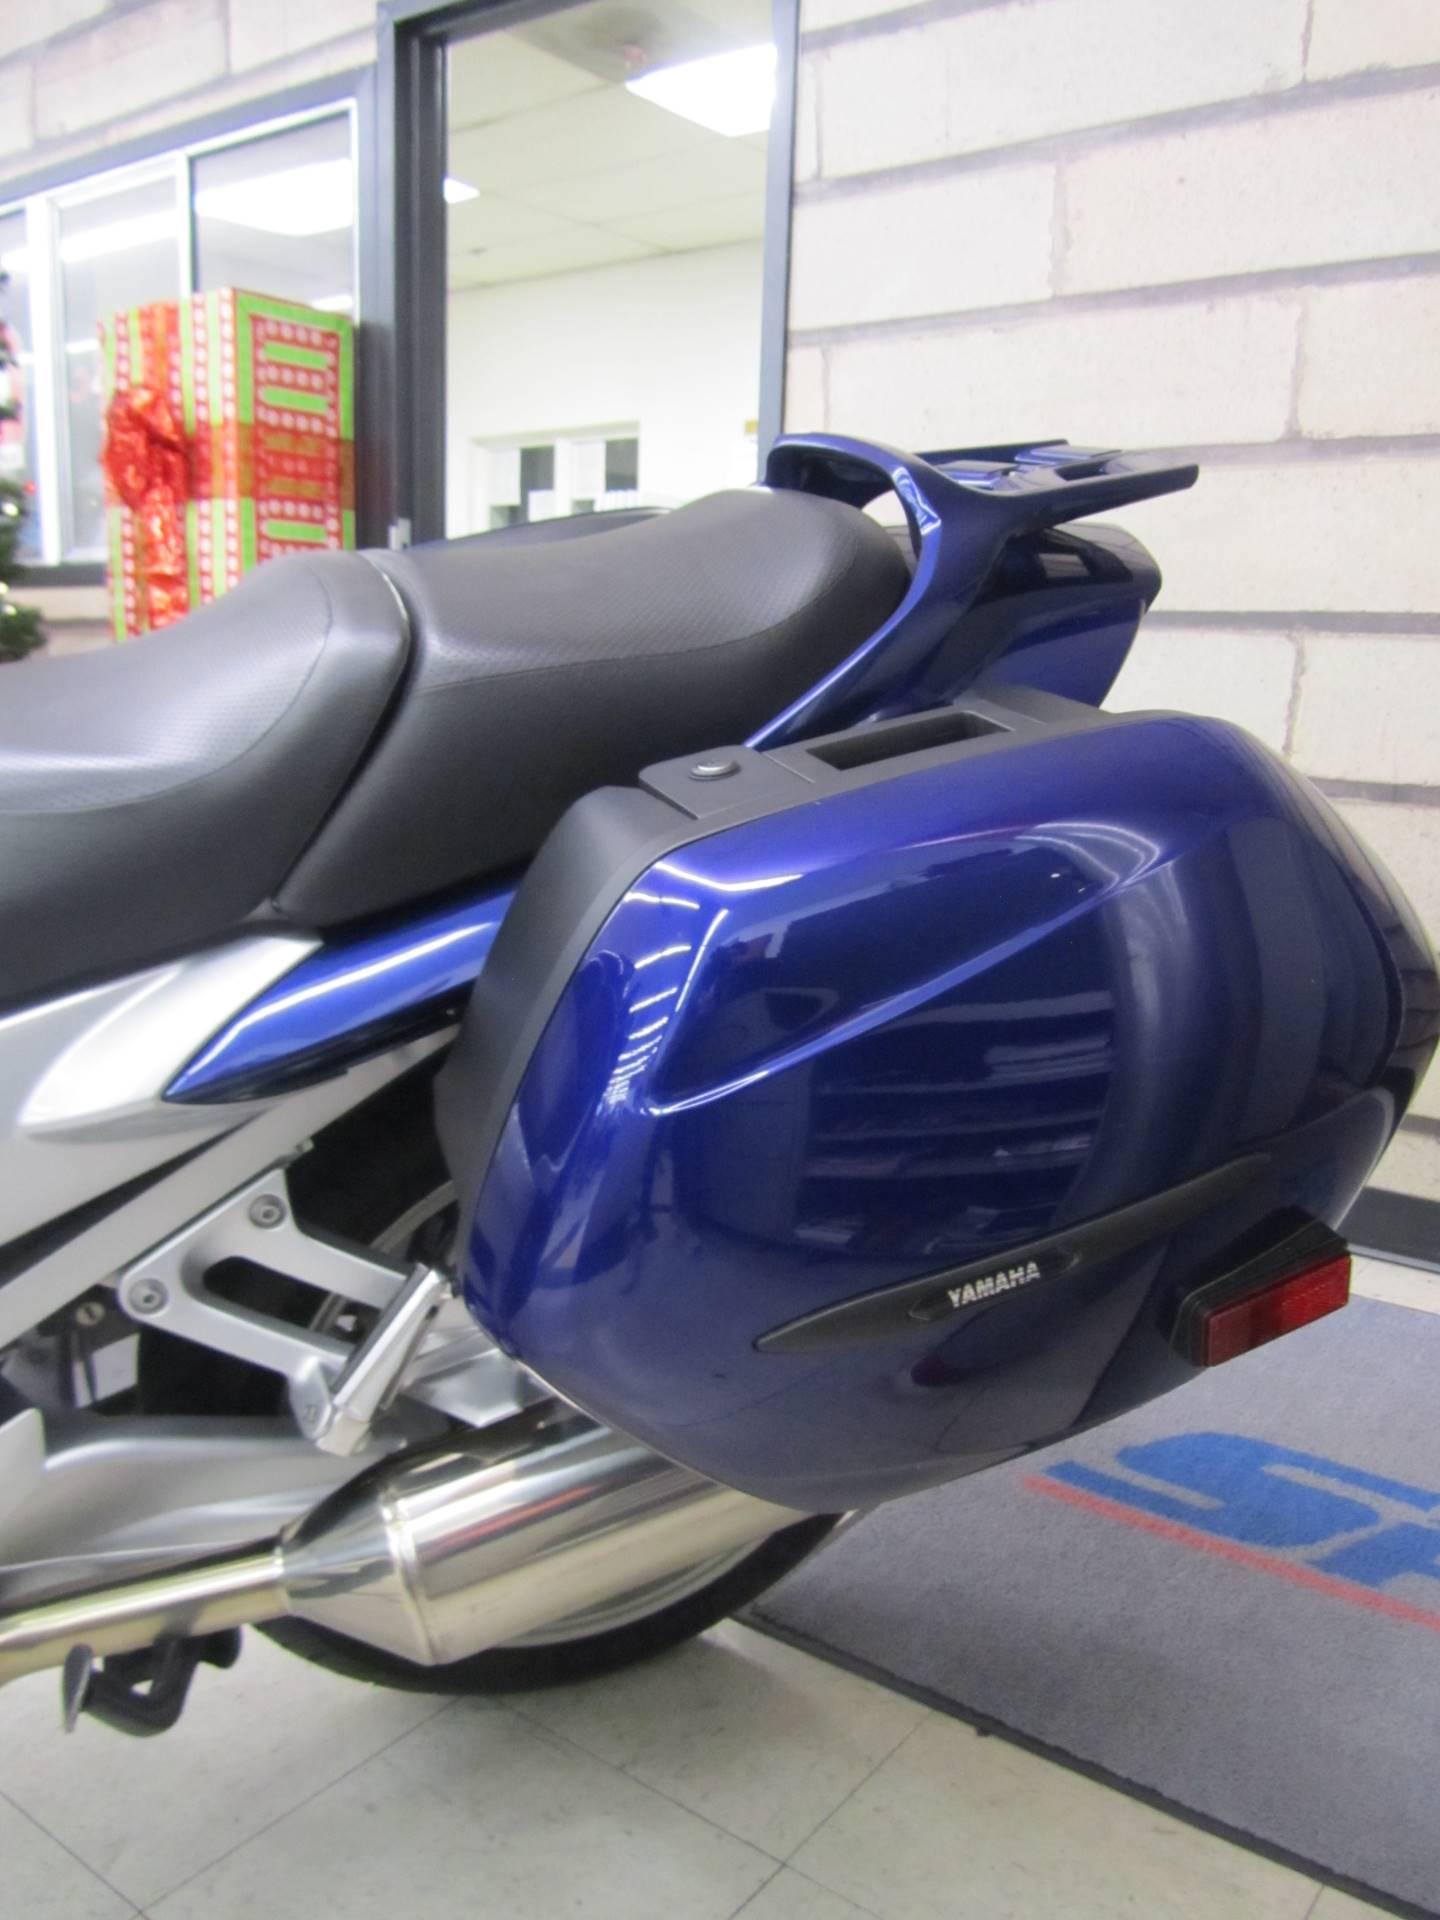 2005 Yamaha FJR 1300A 2